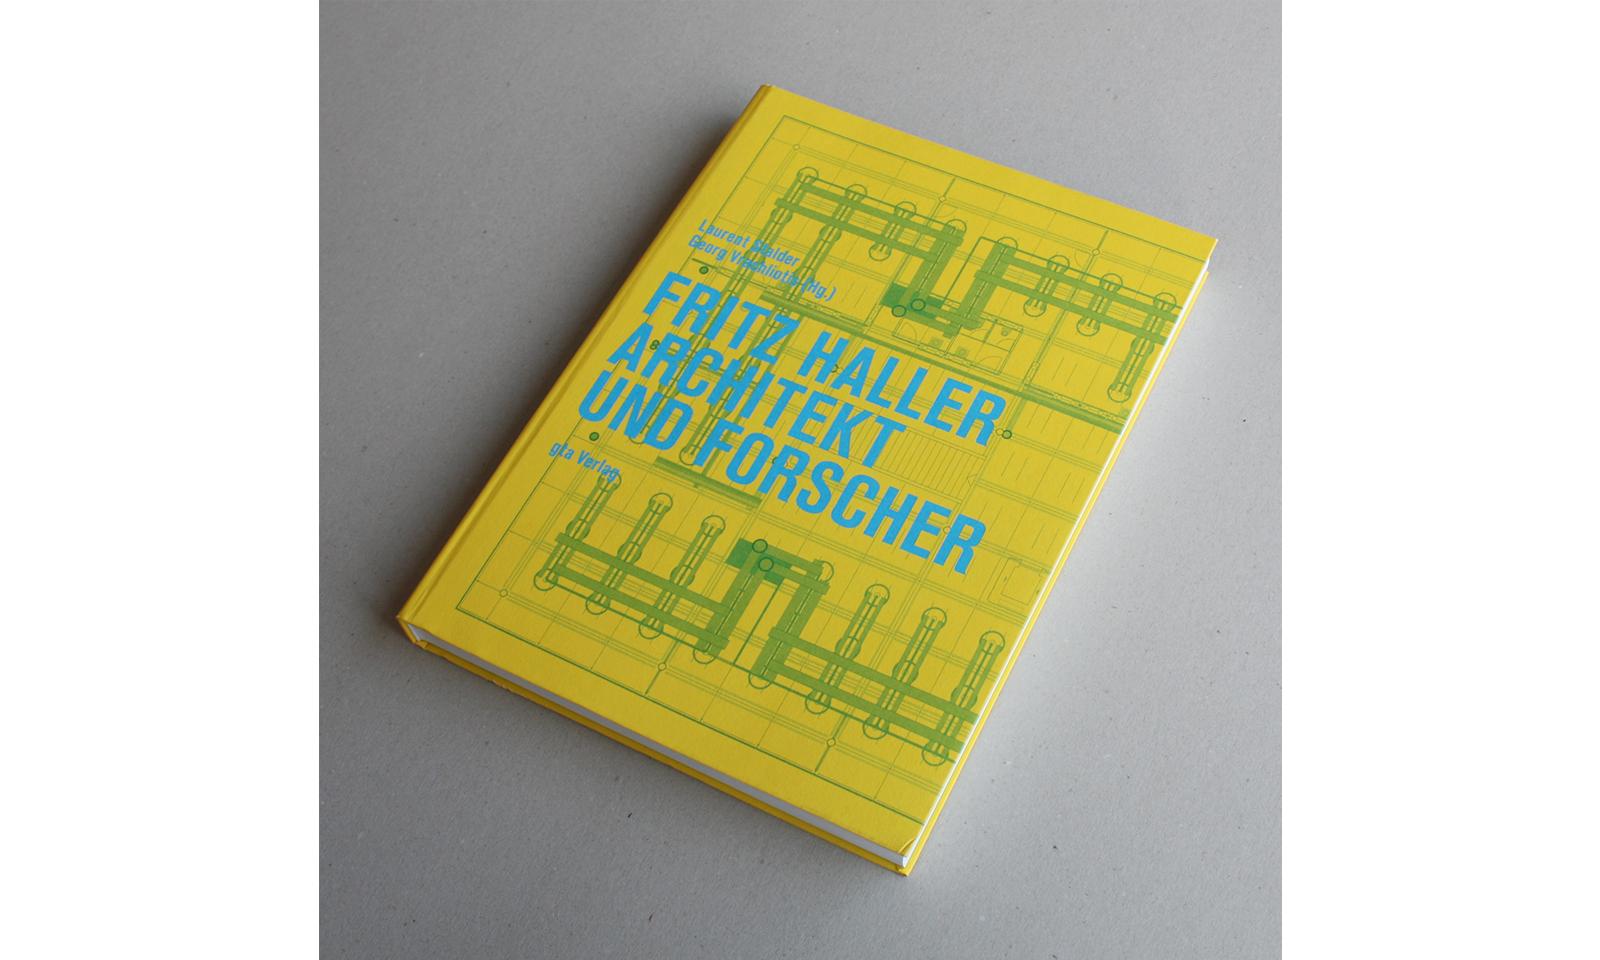 Fritz Haller groß.jpg